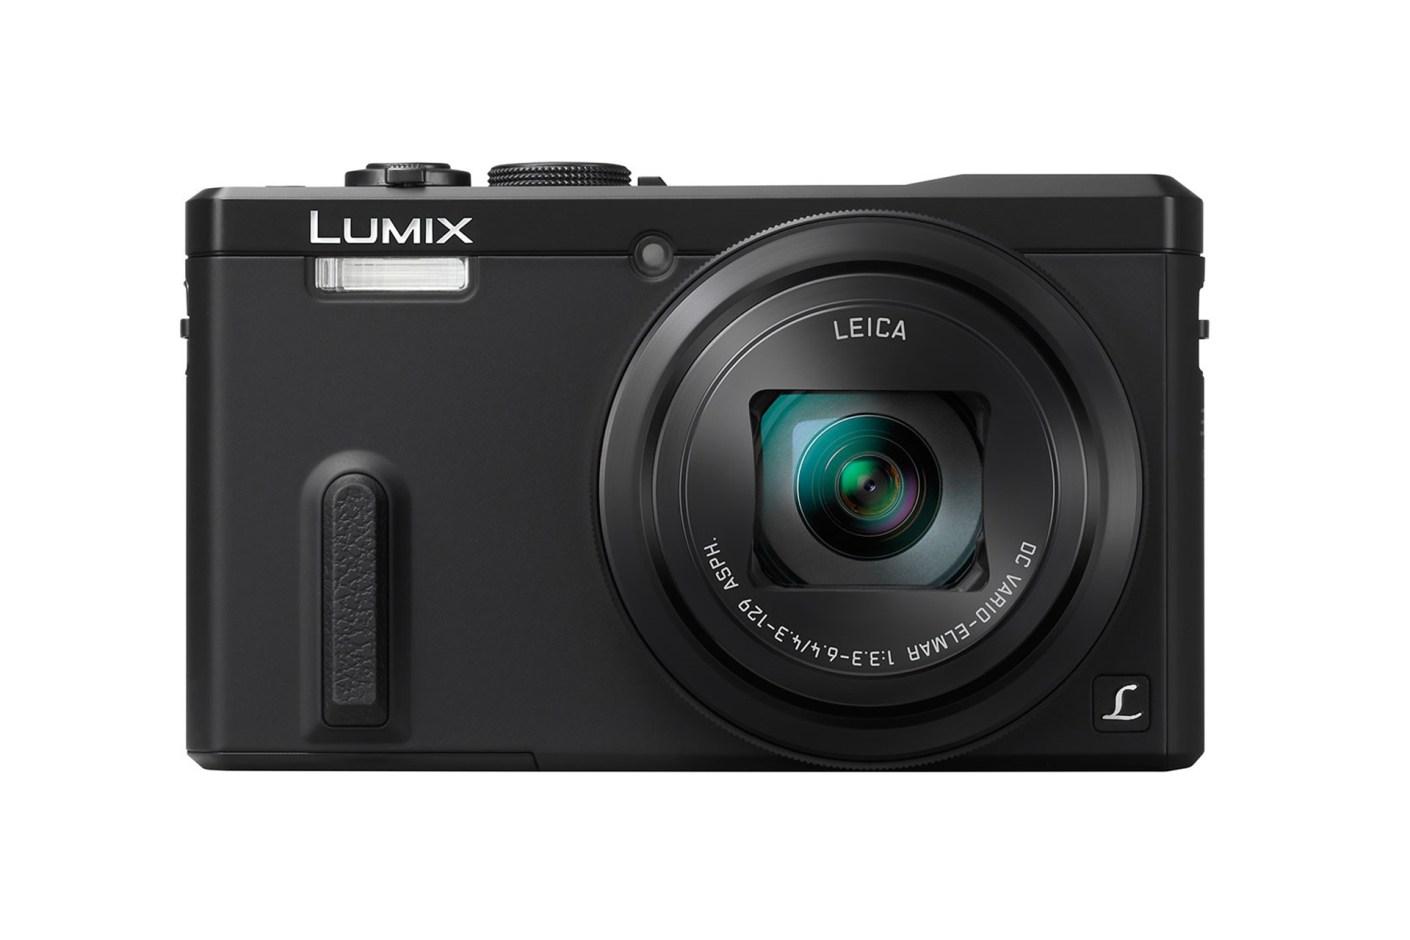 Image of Panasonic Lumix DMC-ZS40 Travel Zoom